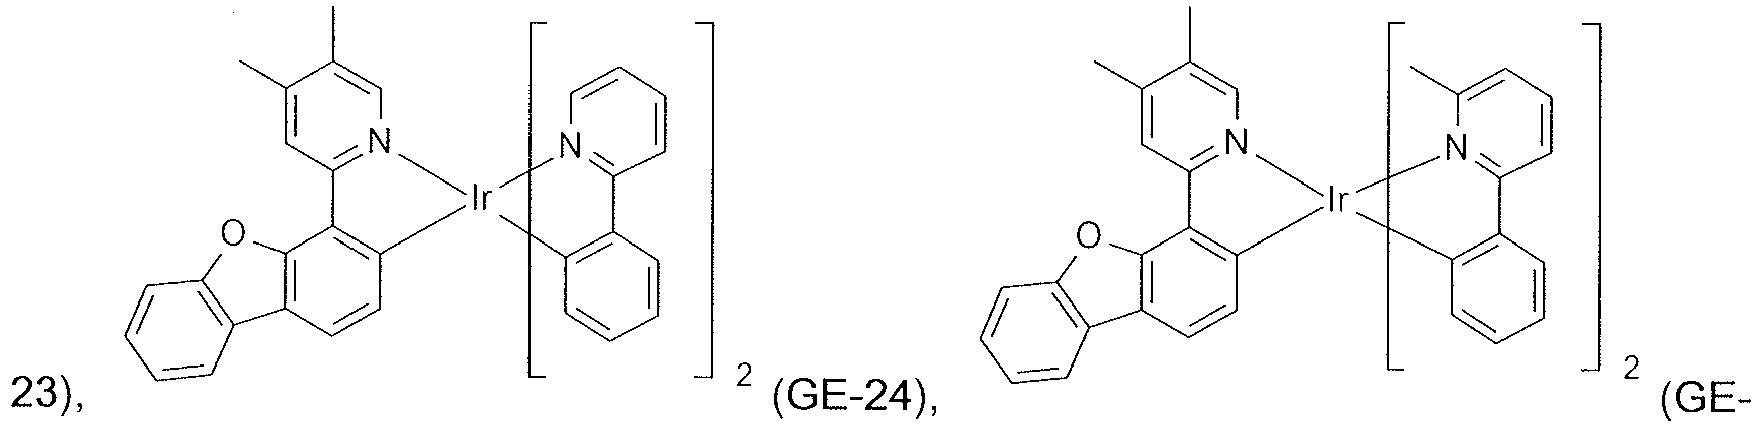 Figure imgb0661